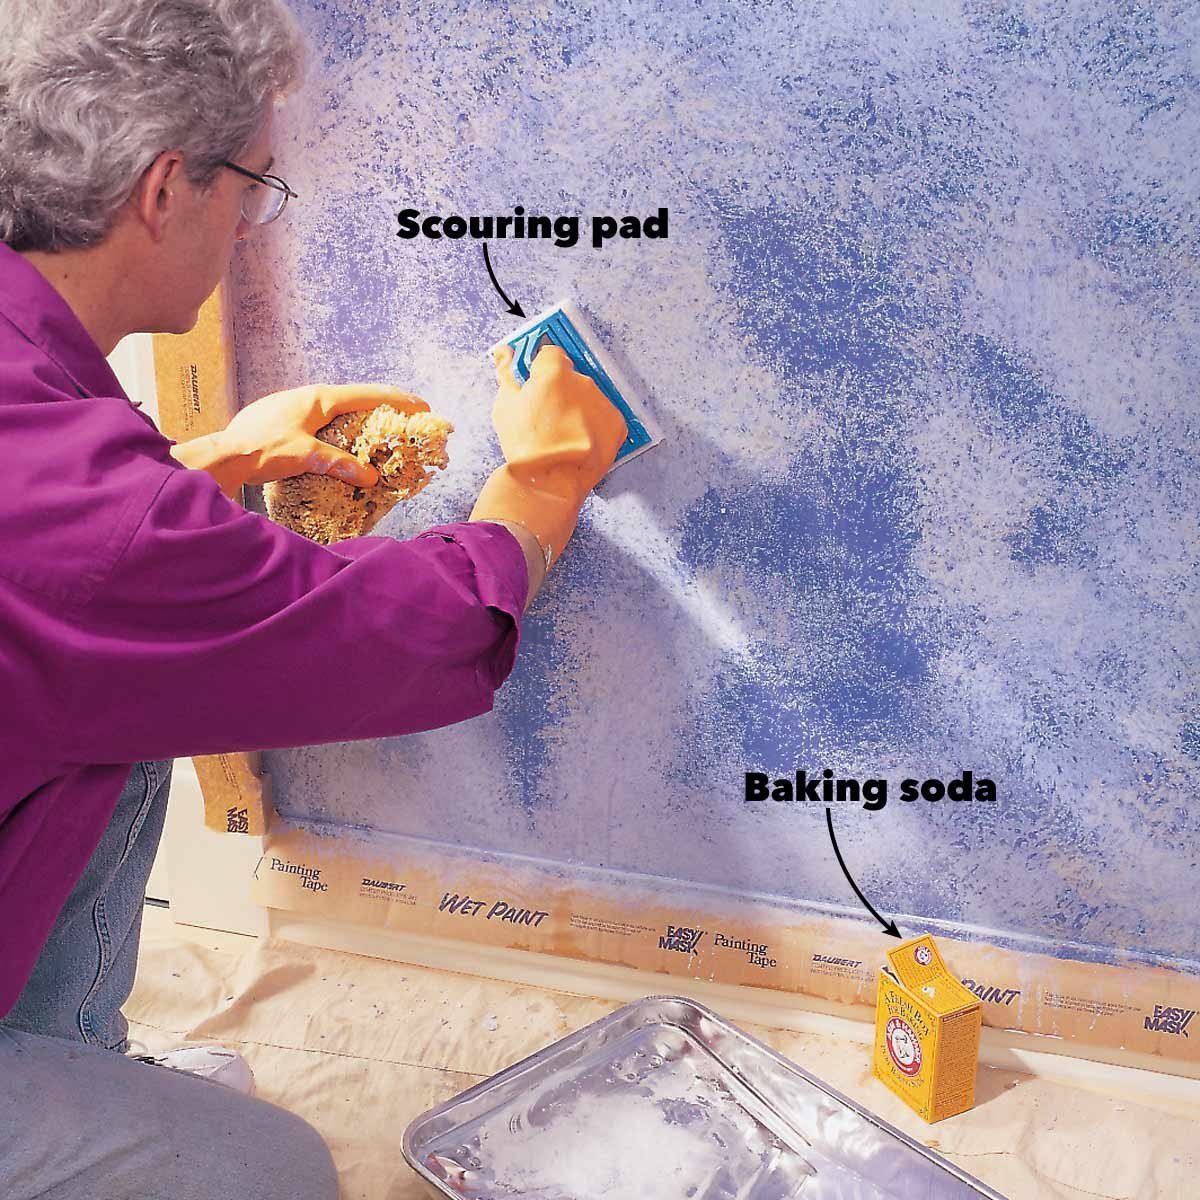 FH98MAY_01344006-1200 sponge paint